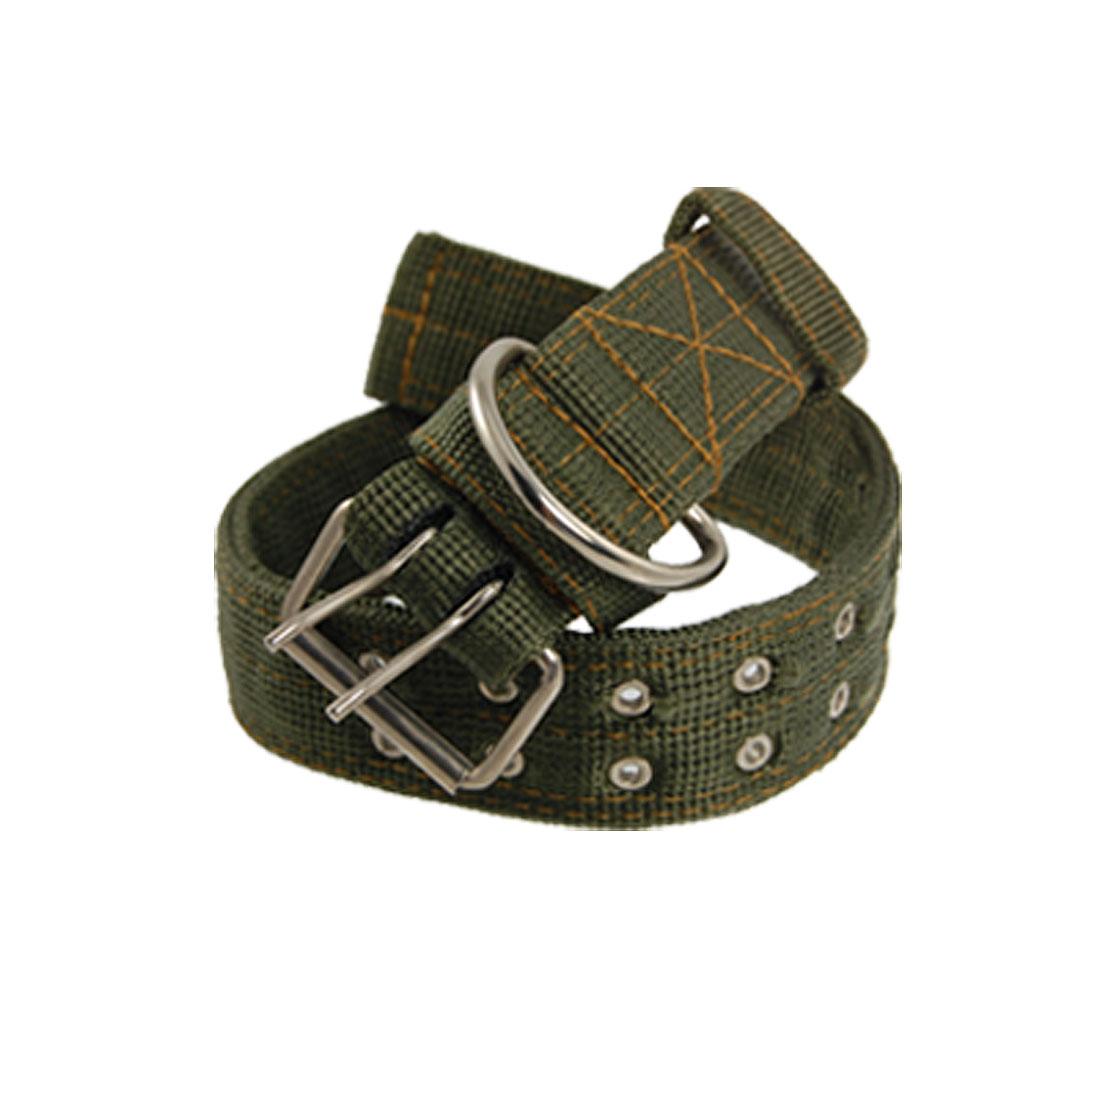 Dual Pin Buckle Army Green Nylon Fabric Pet Dog Leash Collar